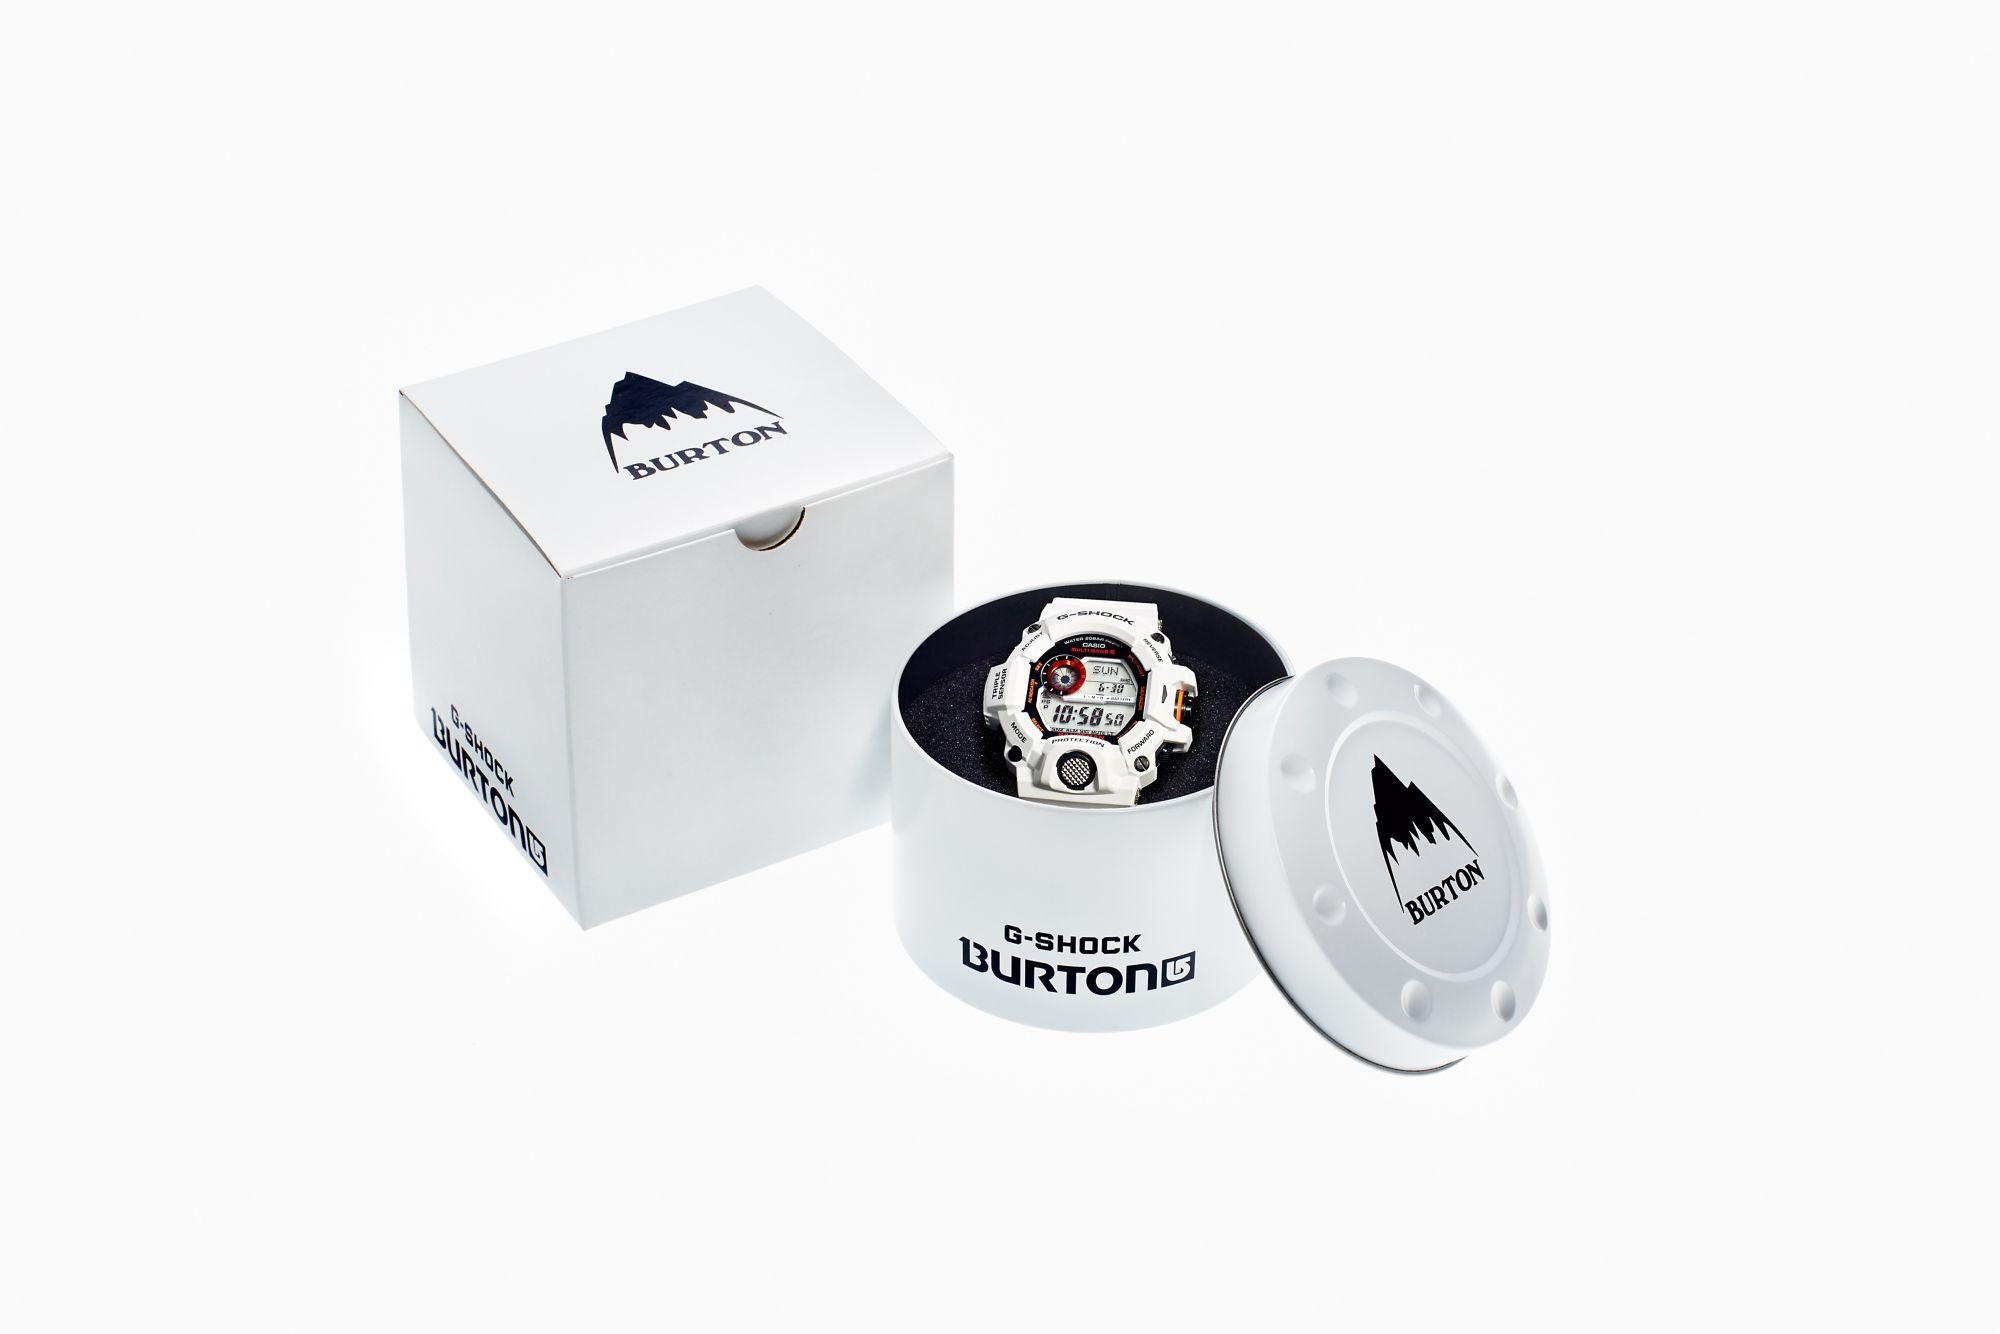 G-SHOCK Rangeman & Burton GW-9400BTJ